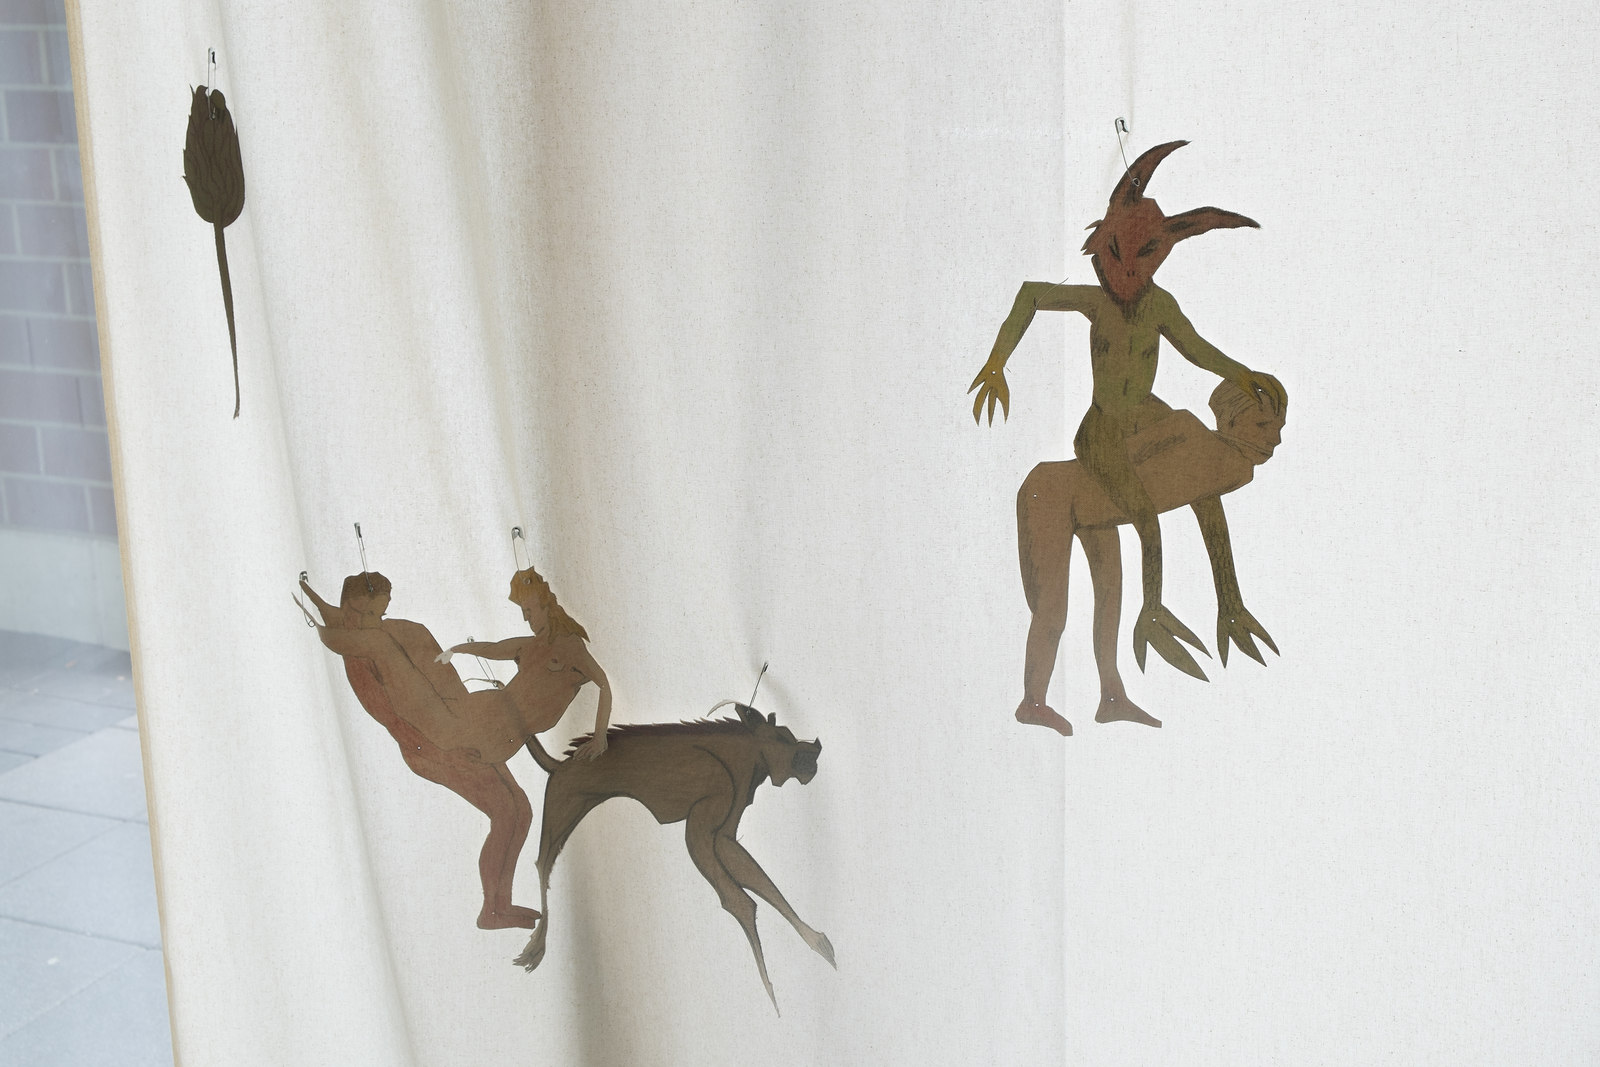 12_Aleksander Hardashnakov_Assorted Cutouts, Detail_ICHTS_2016_Dortmunder Kunstverein_Foto Niklas Taleb